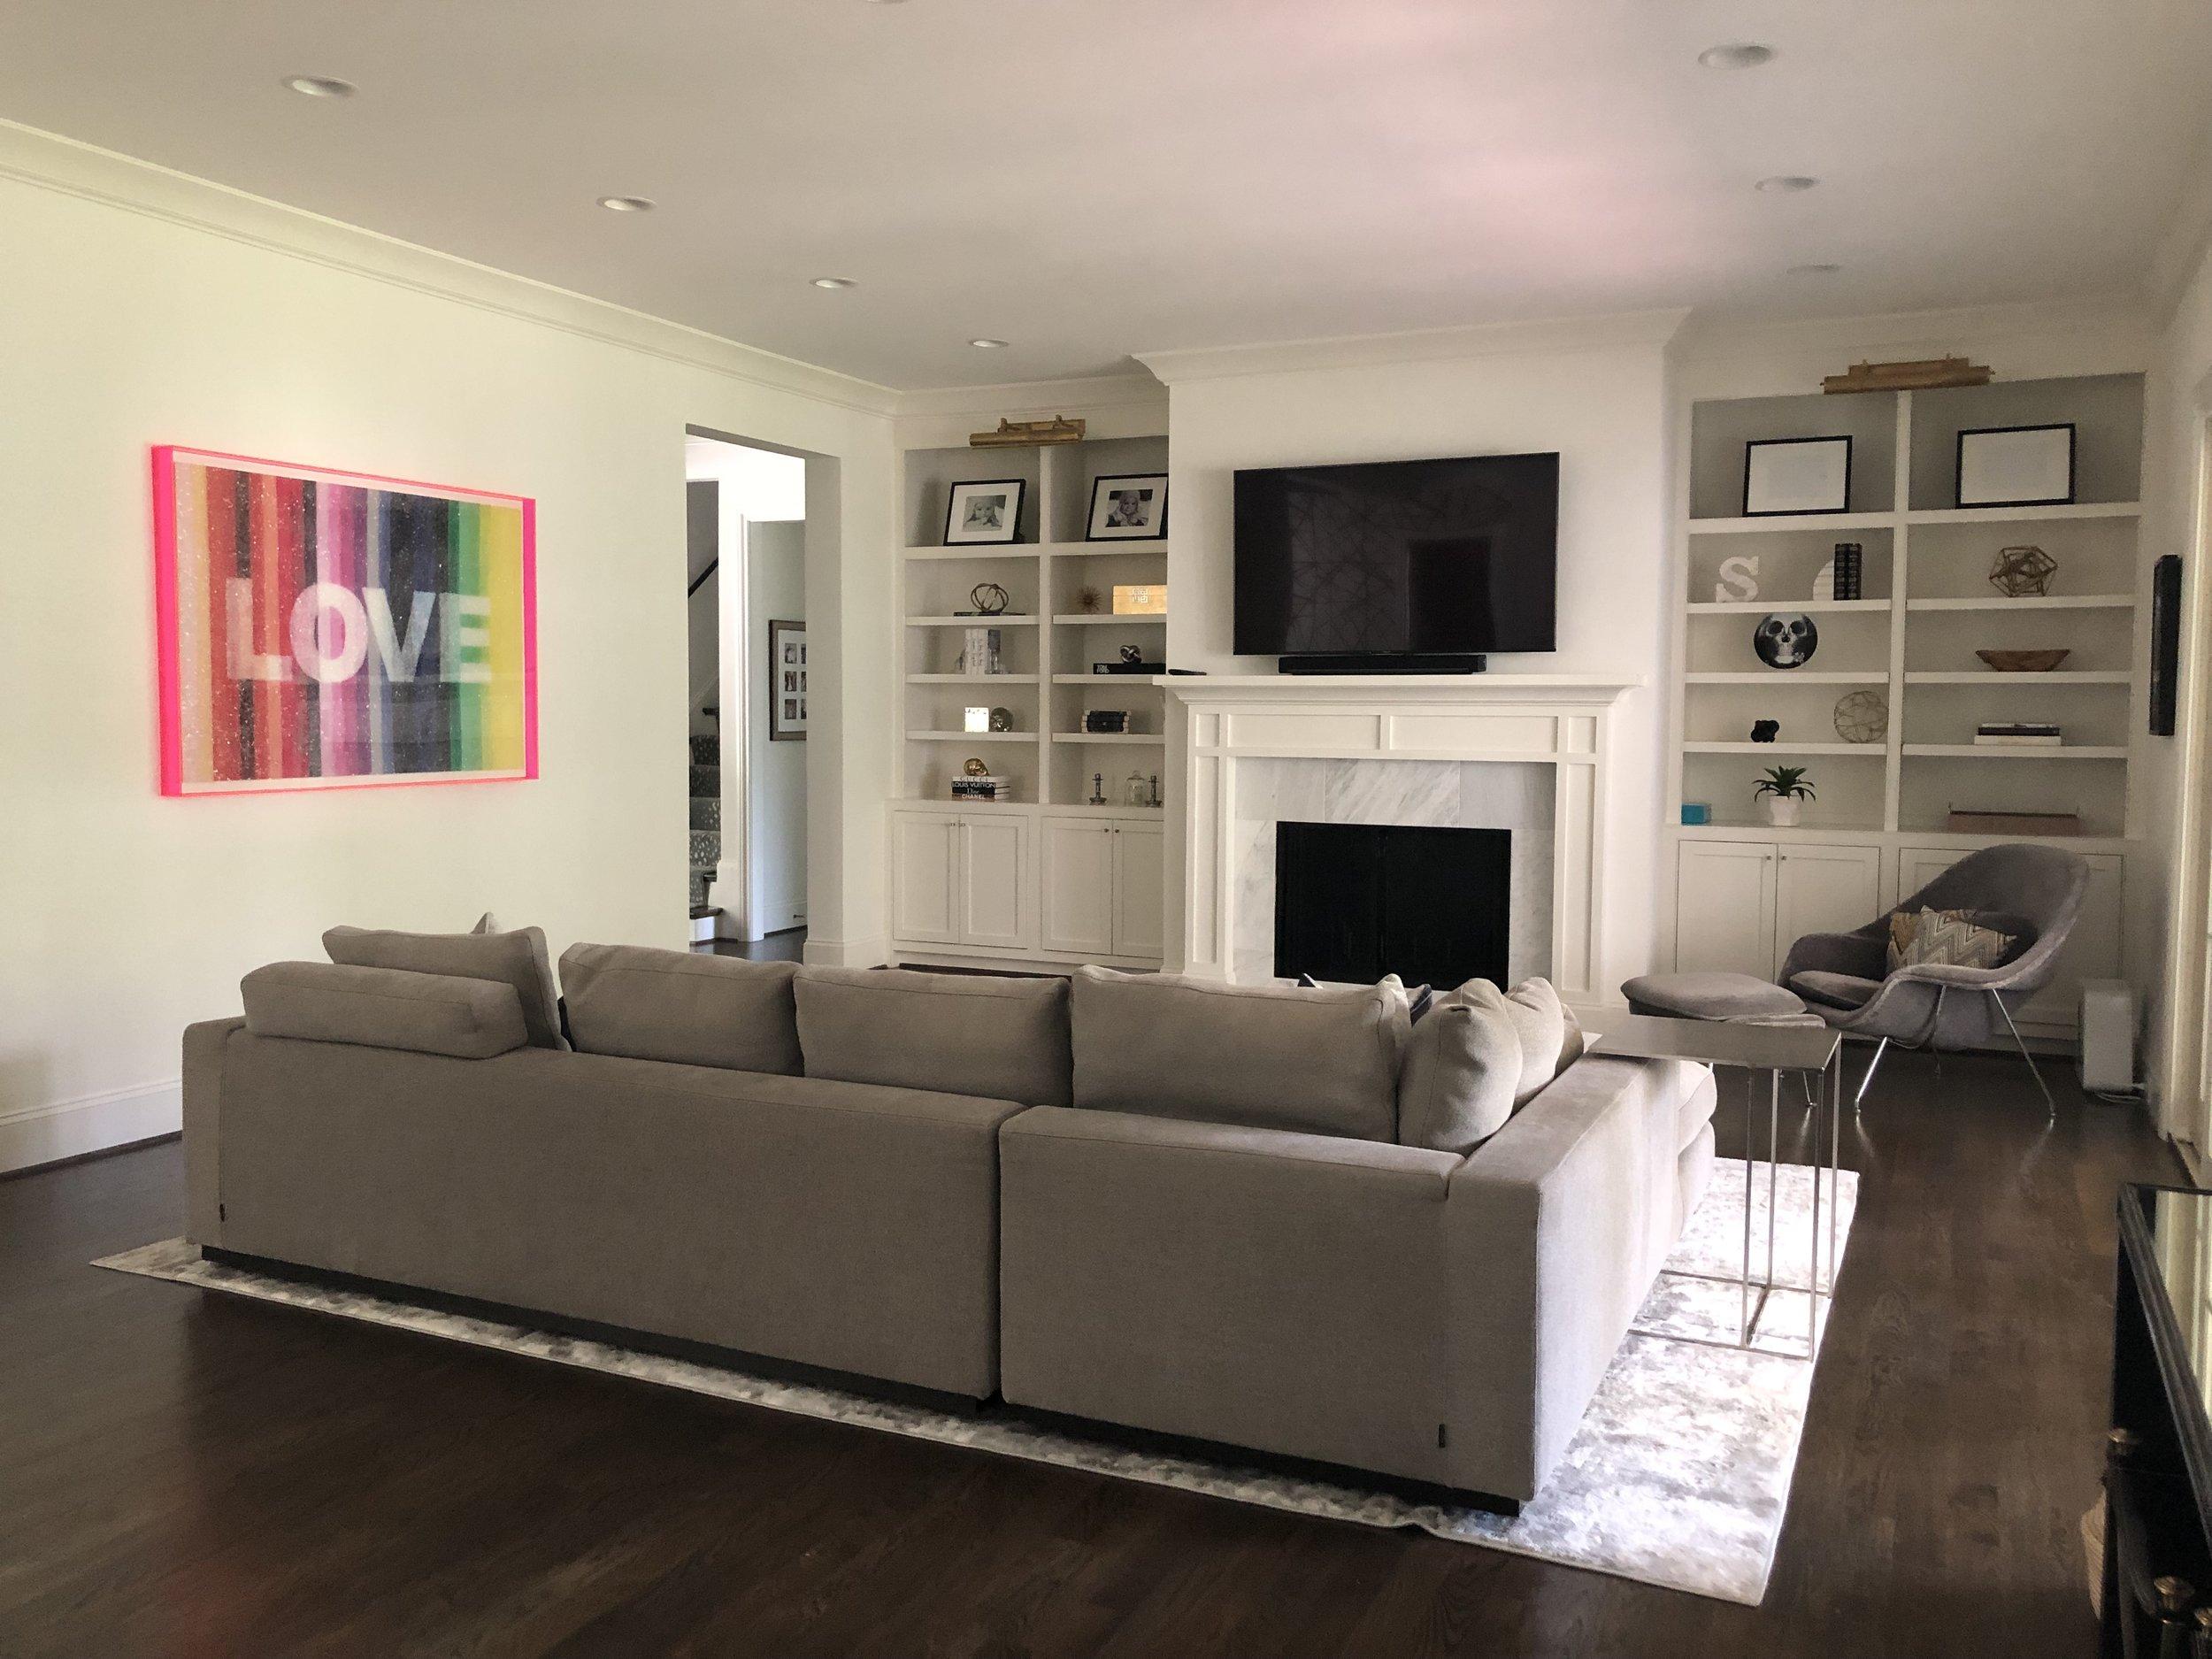 Kristi-Kohut-art-homes-colorful-living-room068.jpg